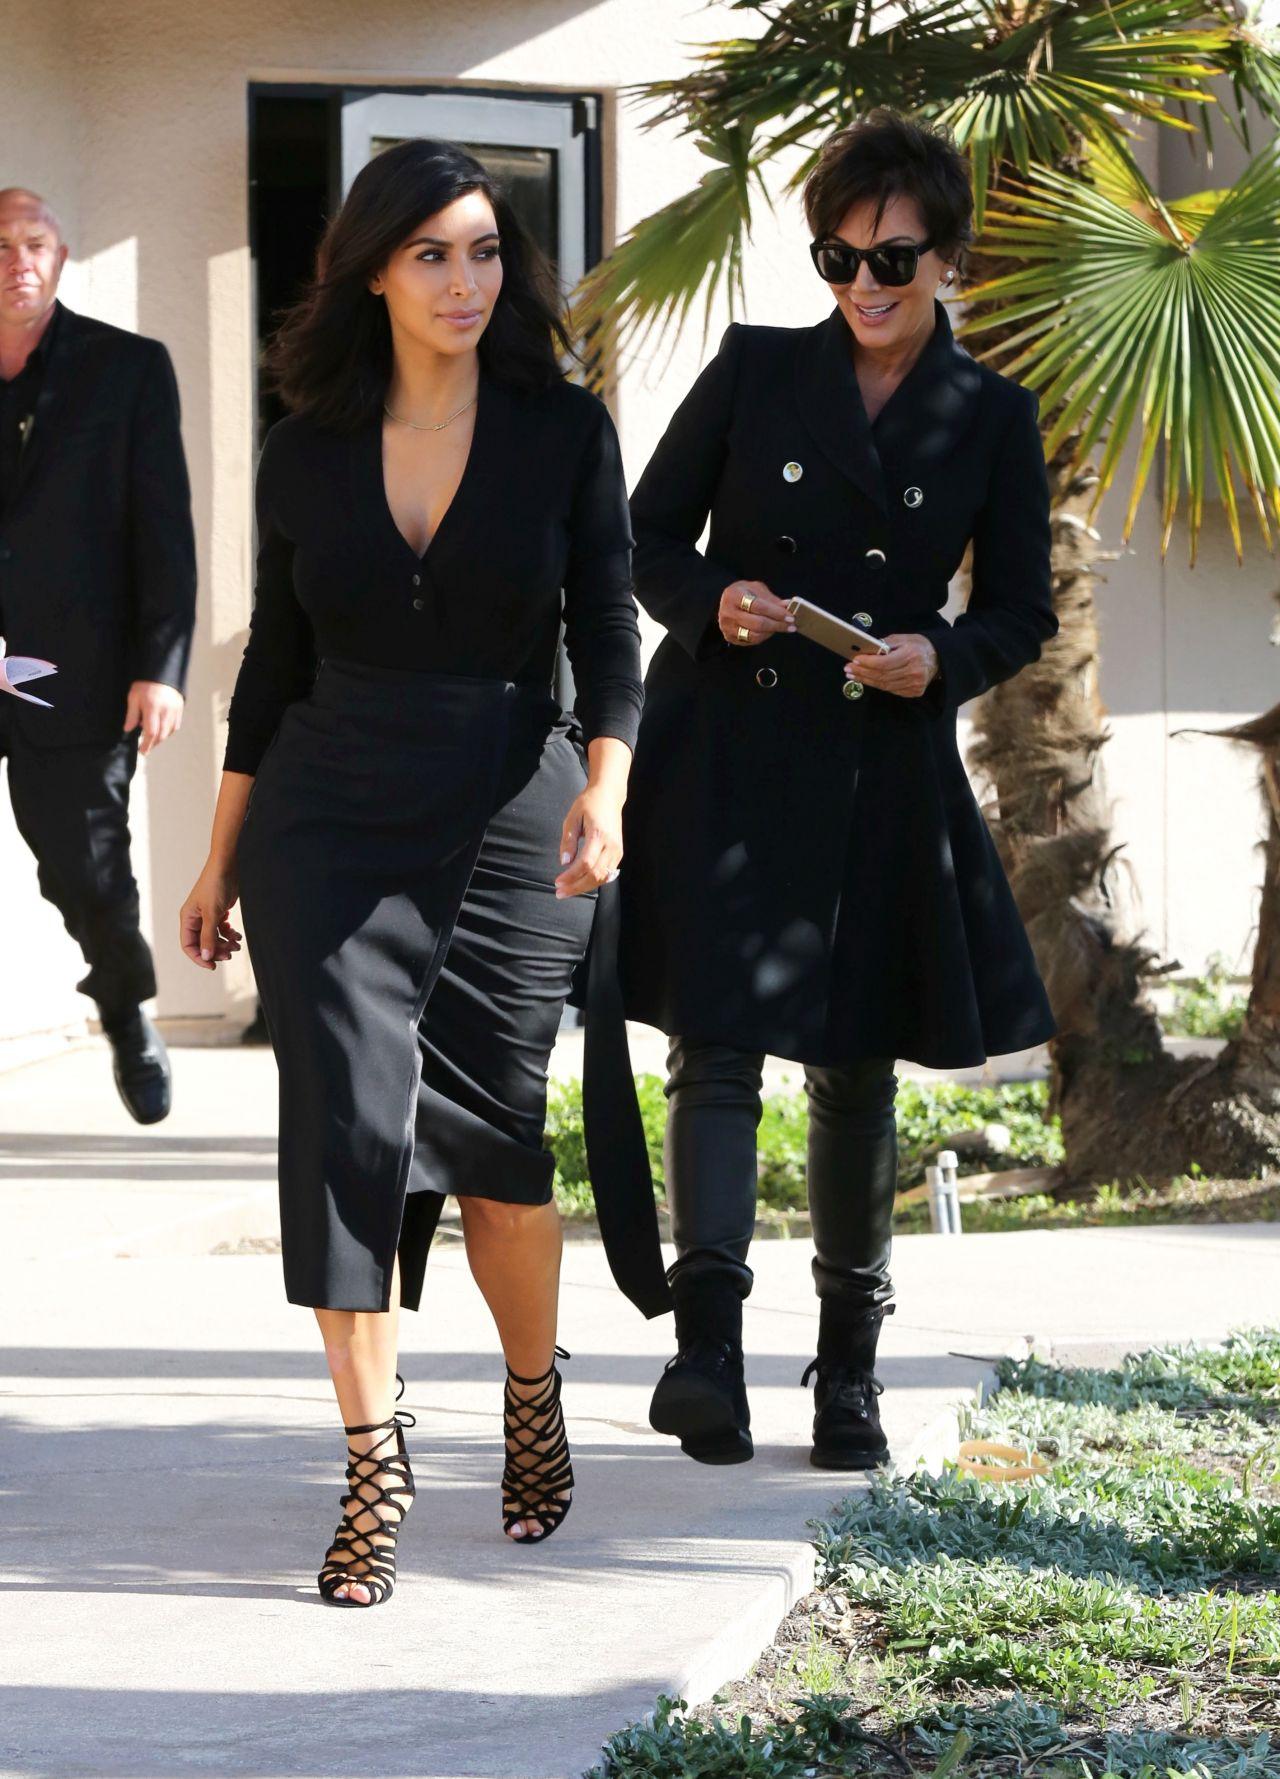 Kim Kardashian 2015 Celebrity Photos Style Filming In